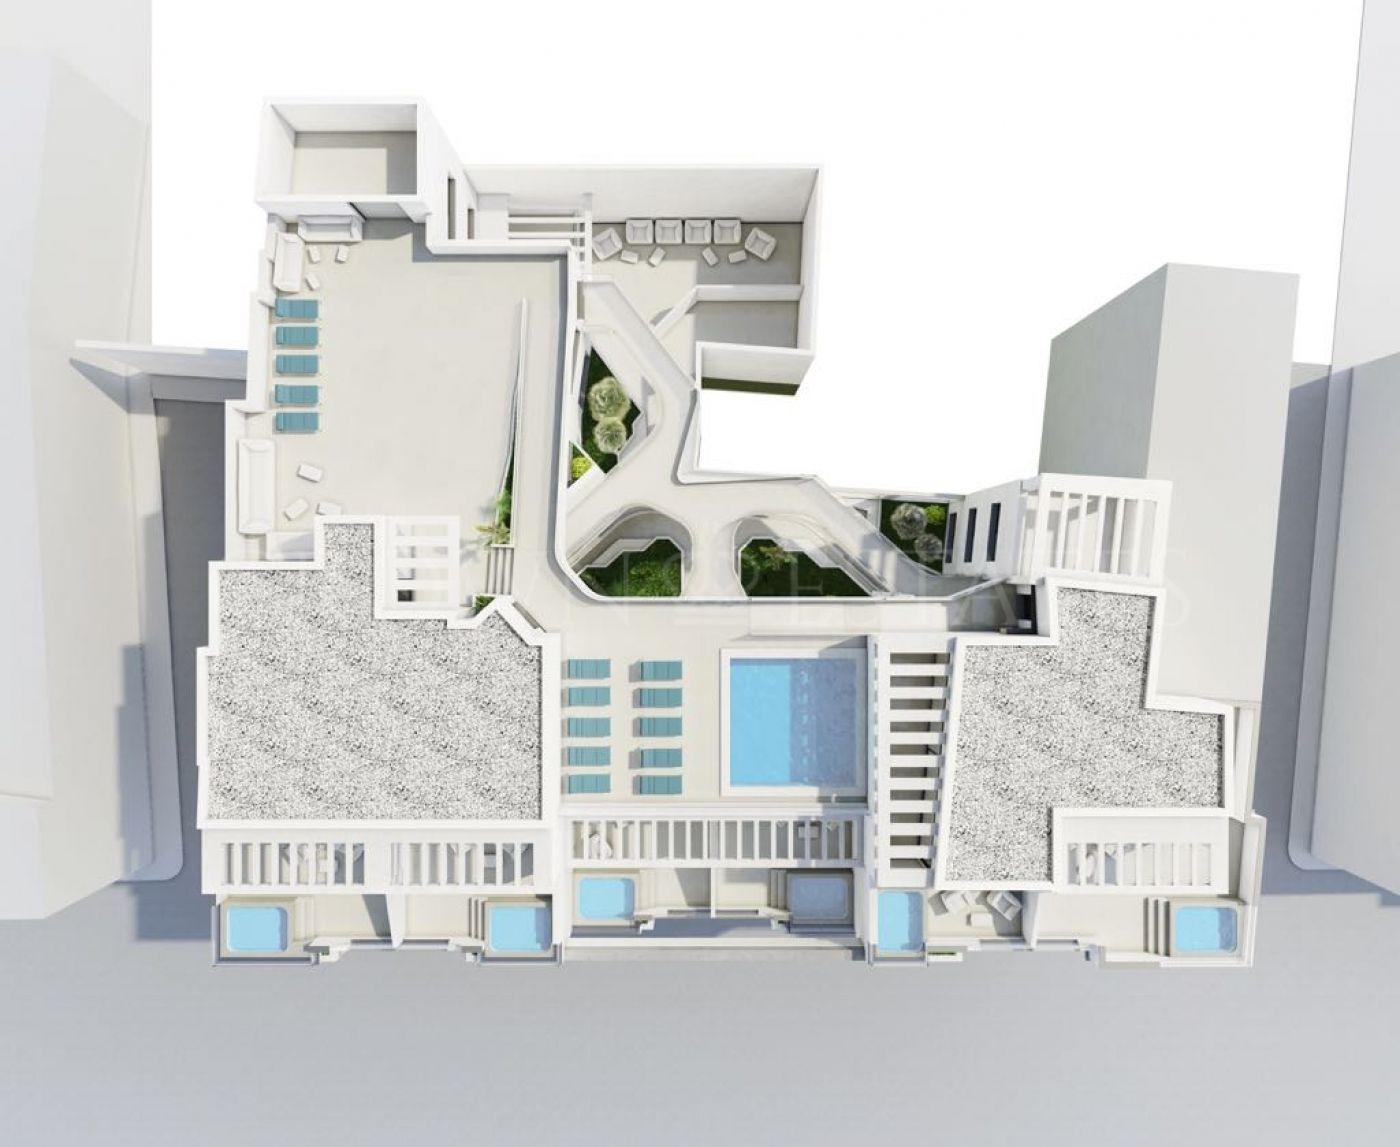 Edificio Ventura II, modern apartments with seaview over the splendid beaches of Tarifa